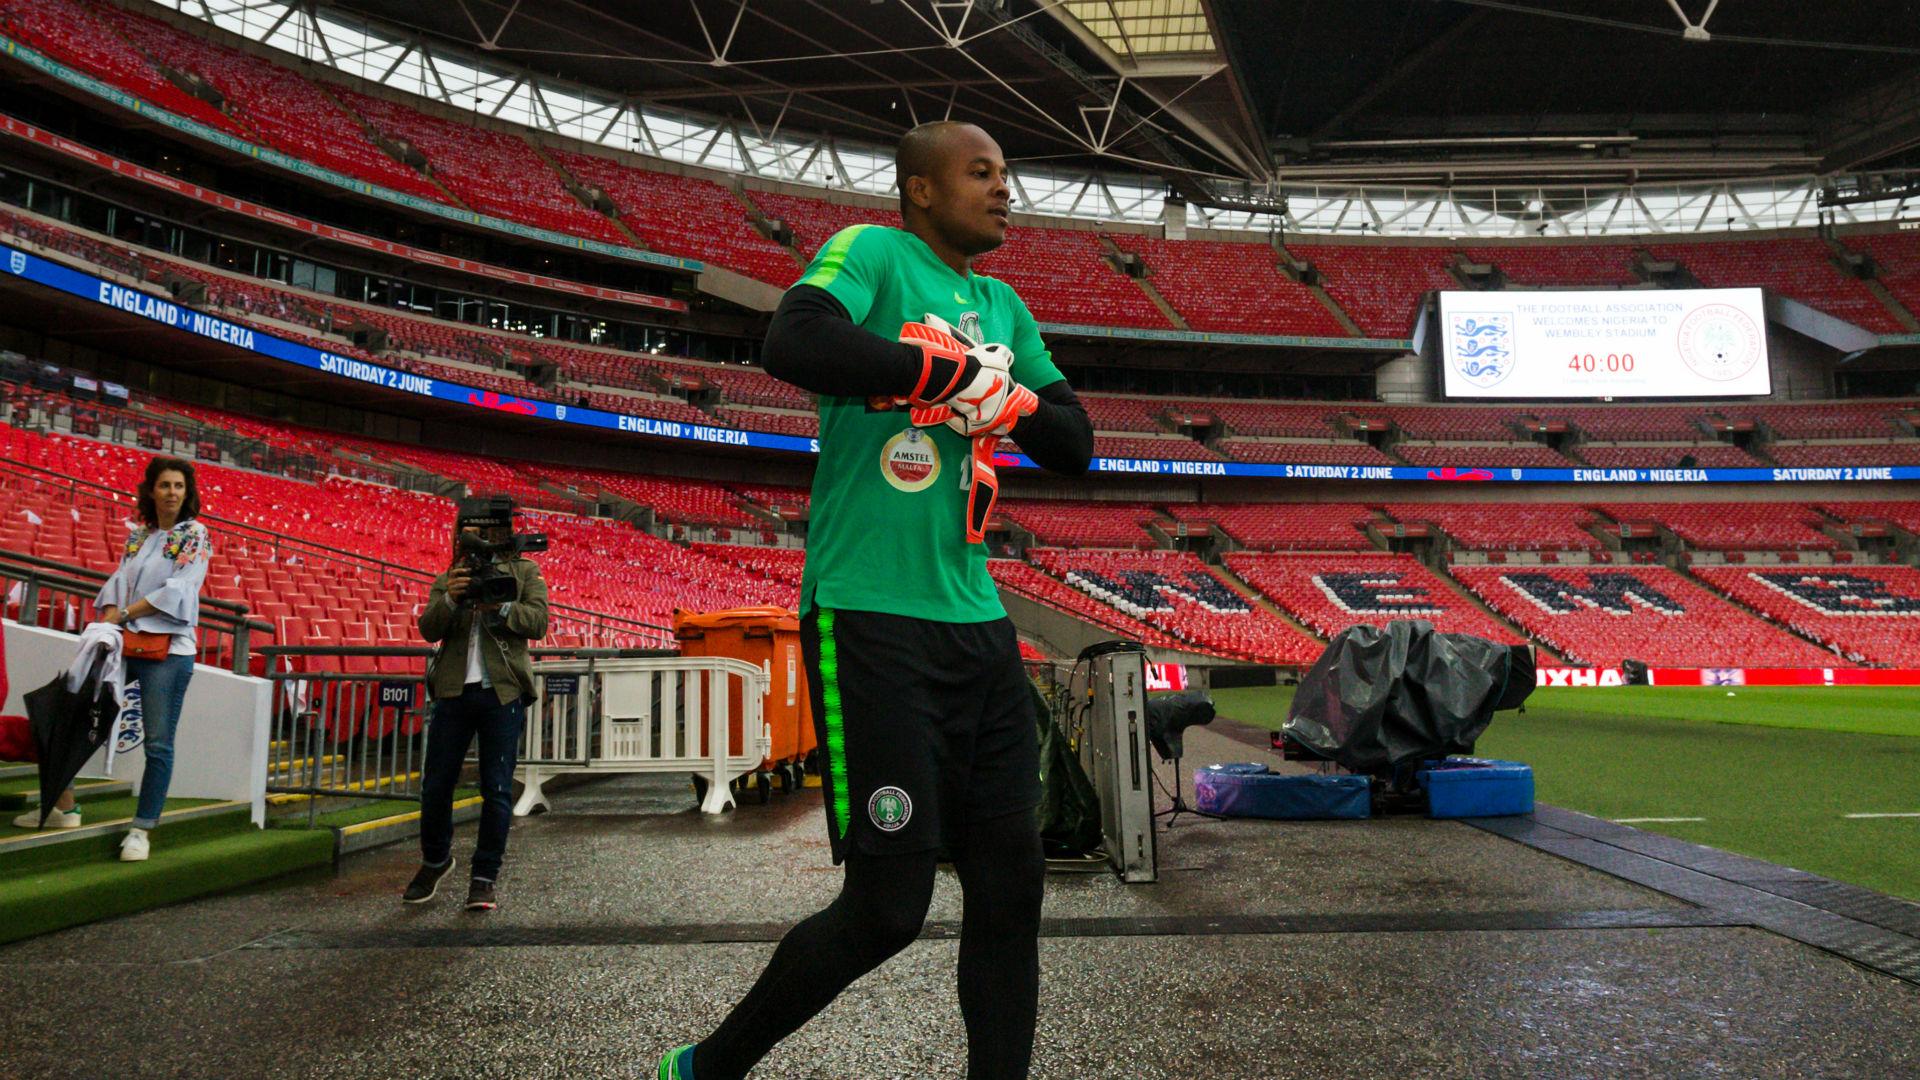 Injury rules Ezenwa out of Nigeria vs Mexico friendly